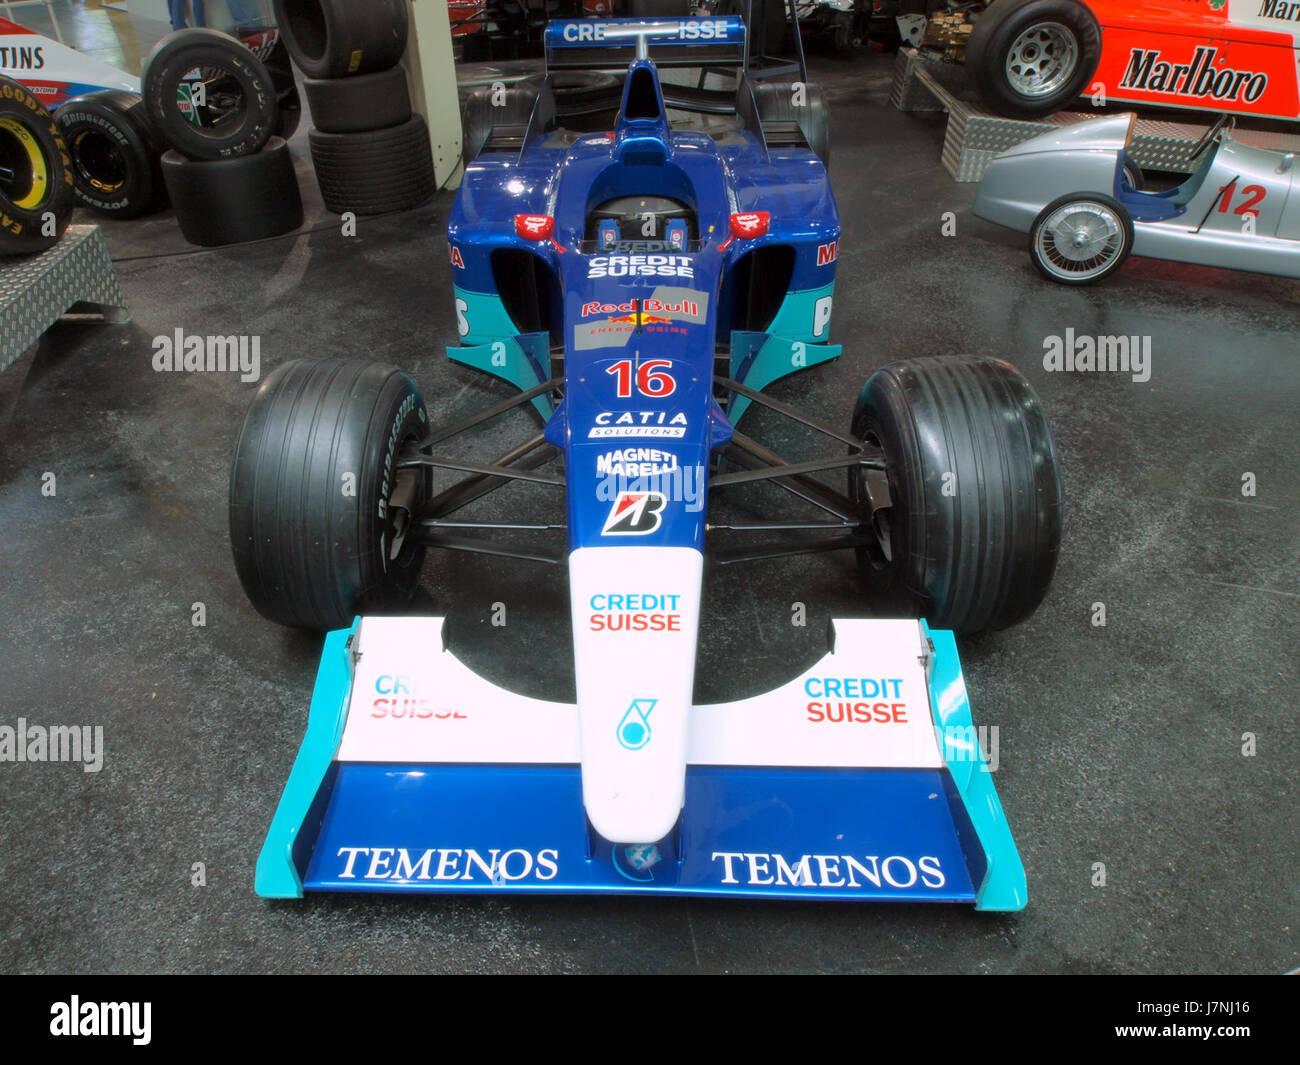 2000 Red Bull Sauber Petronas C19 nel 2001 livrea pic2 Immagini Stock